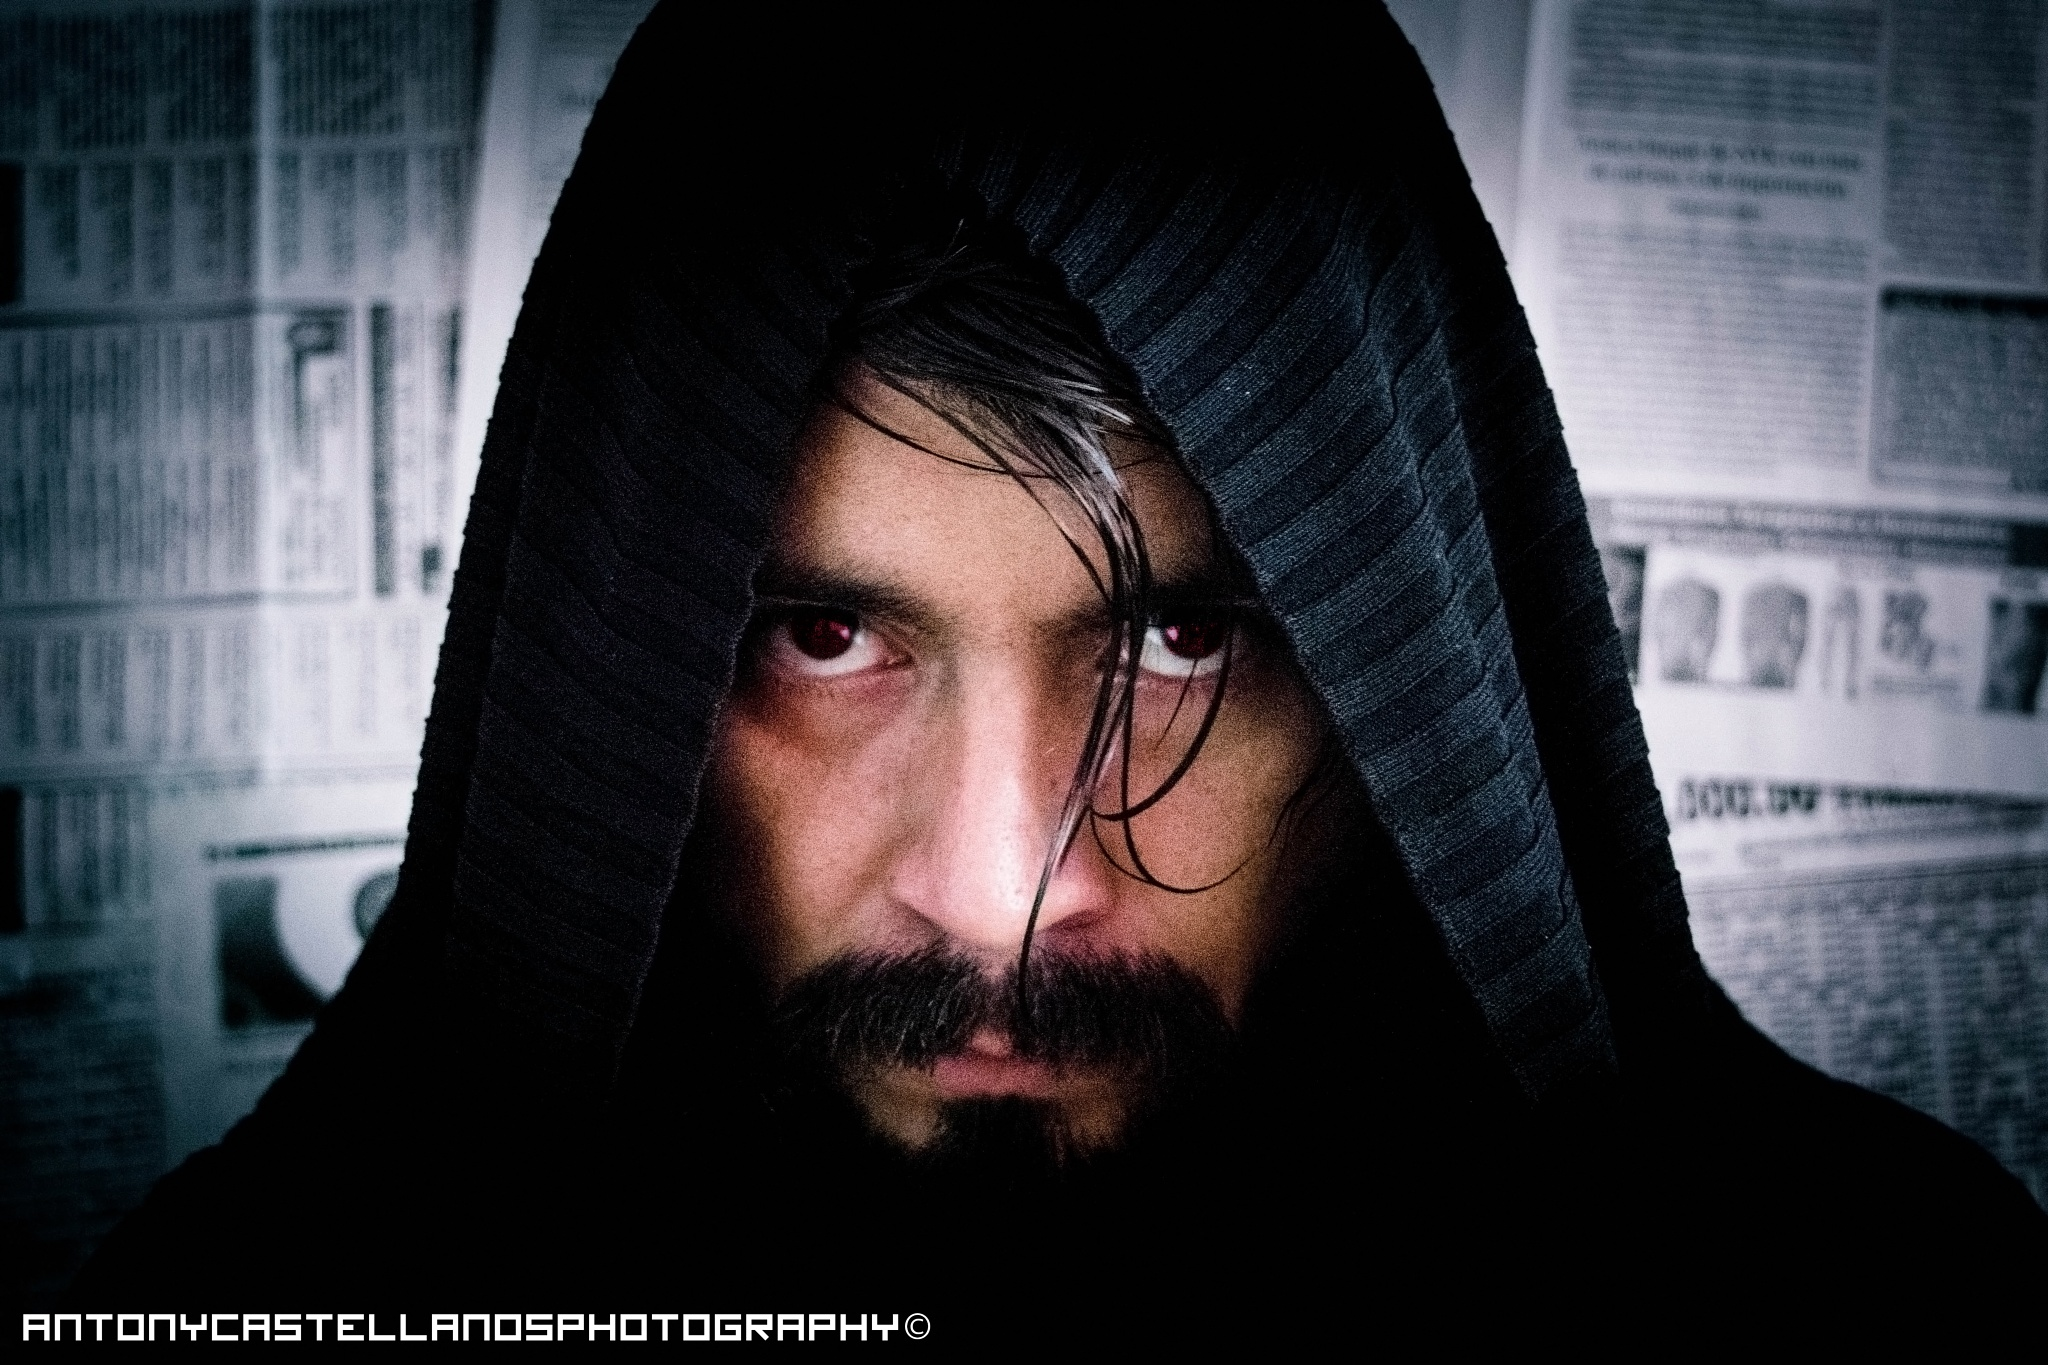 Seduced by the dark side by Antony Castellanos